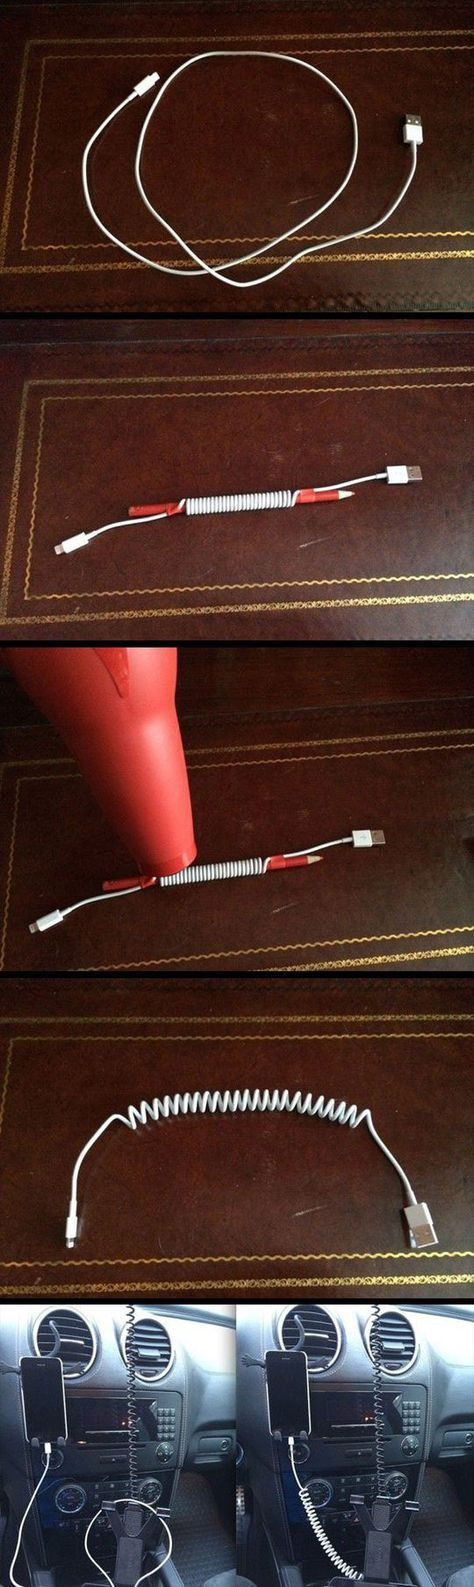 Trick gegen nervende Kabel | Webfail - Fail Bilder und Fail Videos